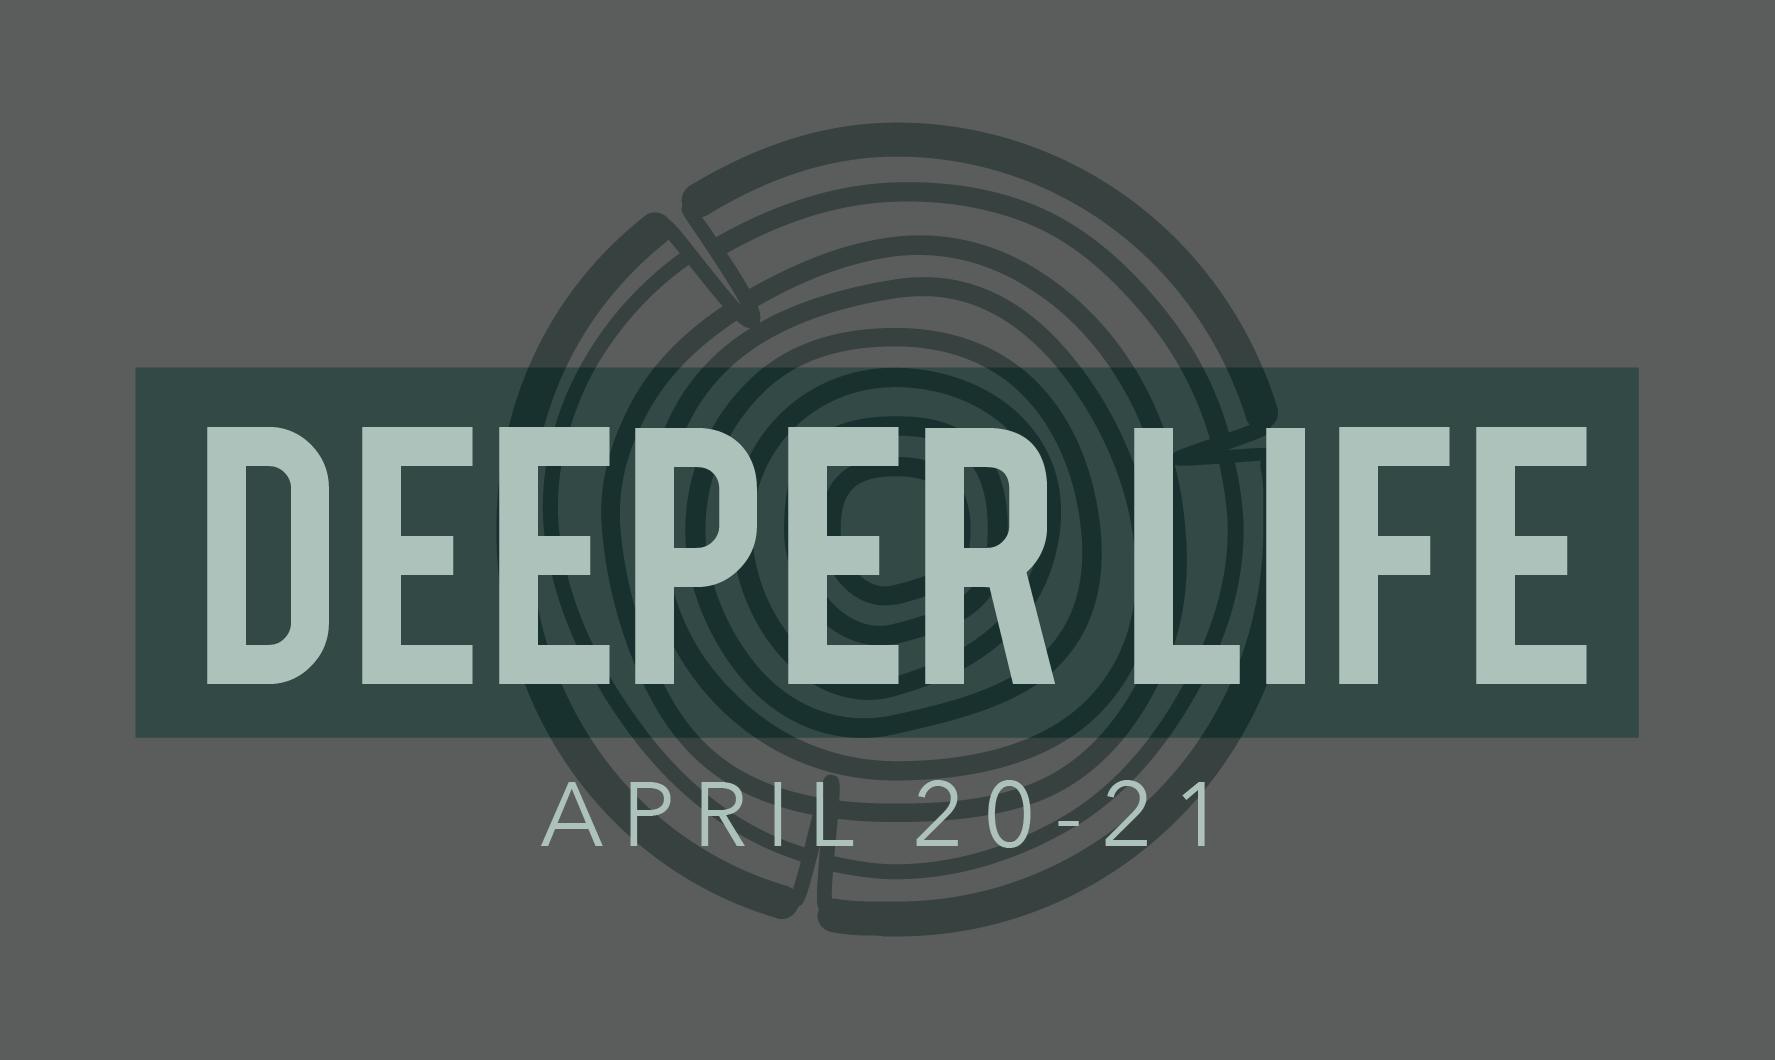 Deeperlife2018withdate